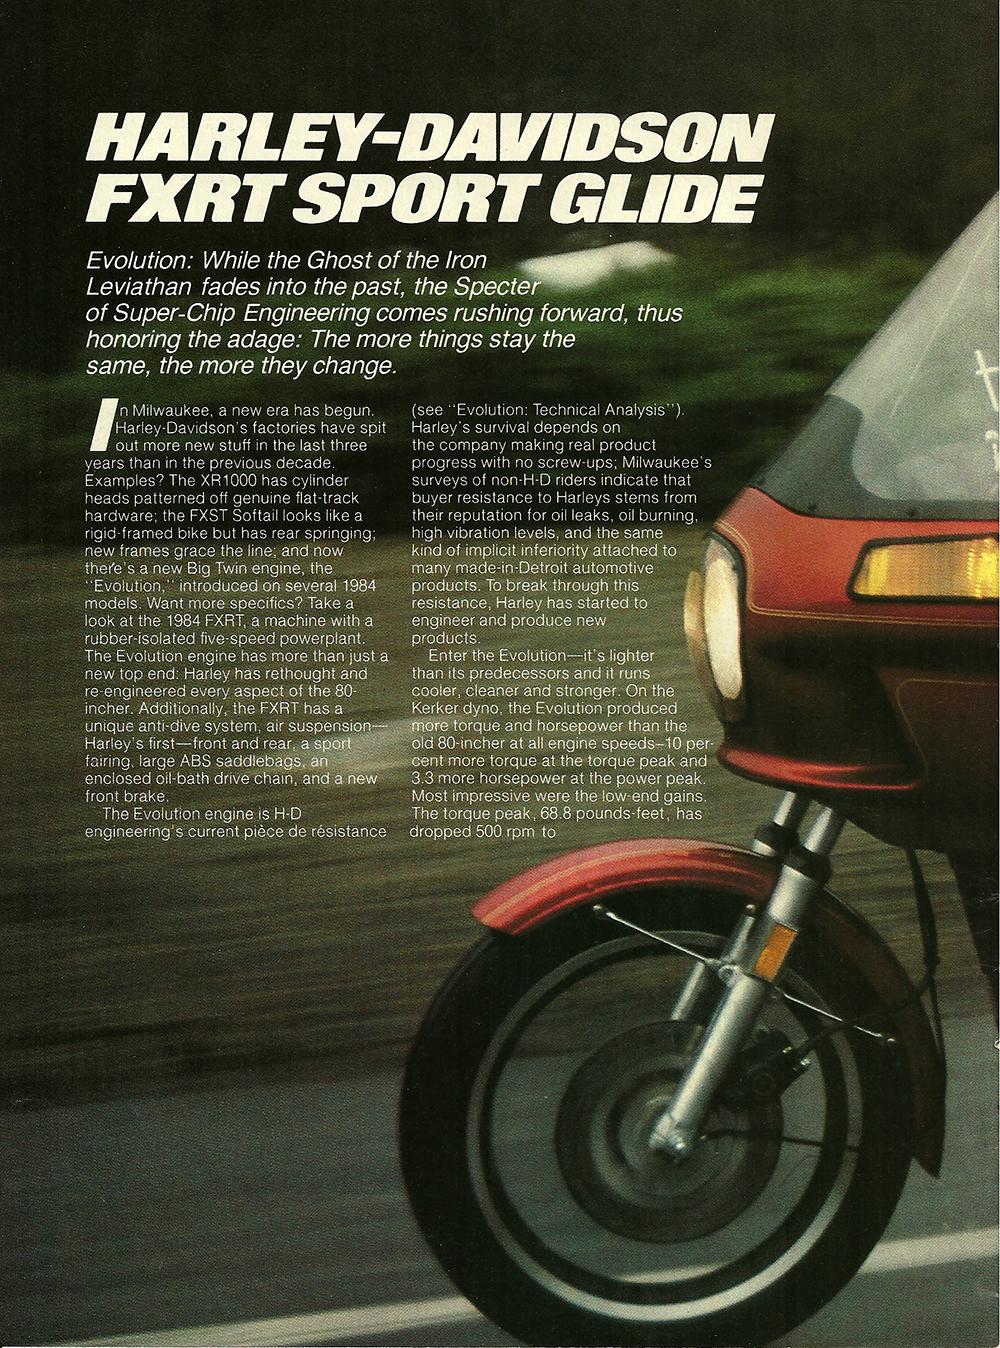 1983 Harley Davidson FXRT Sport Glide road test 1.jpg